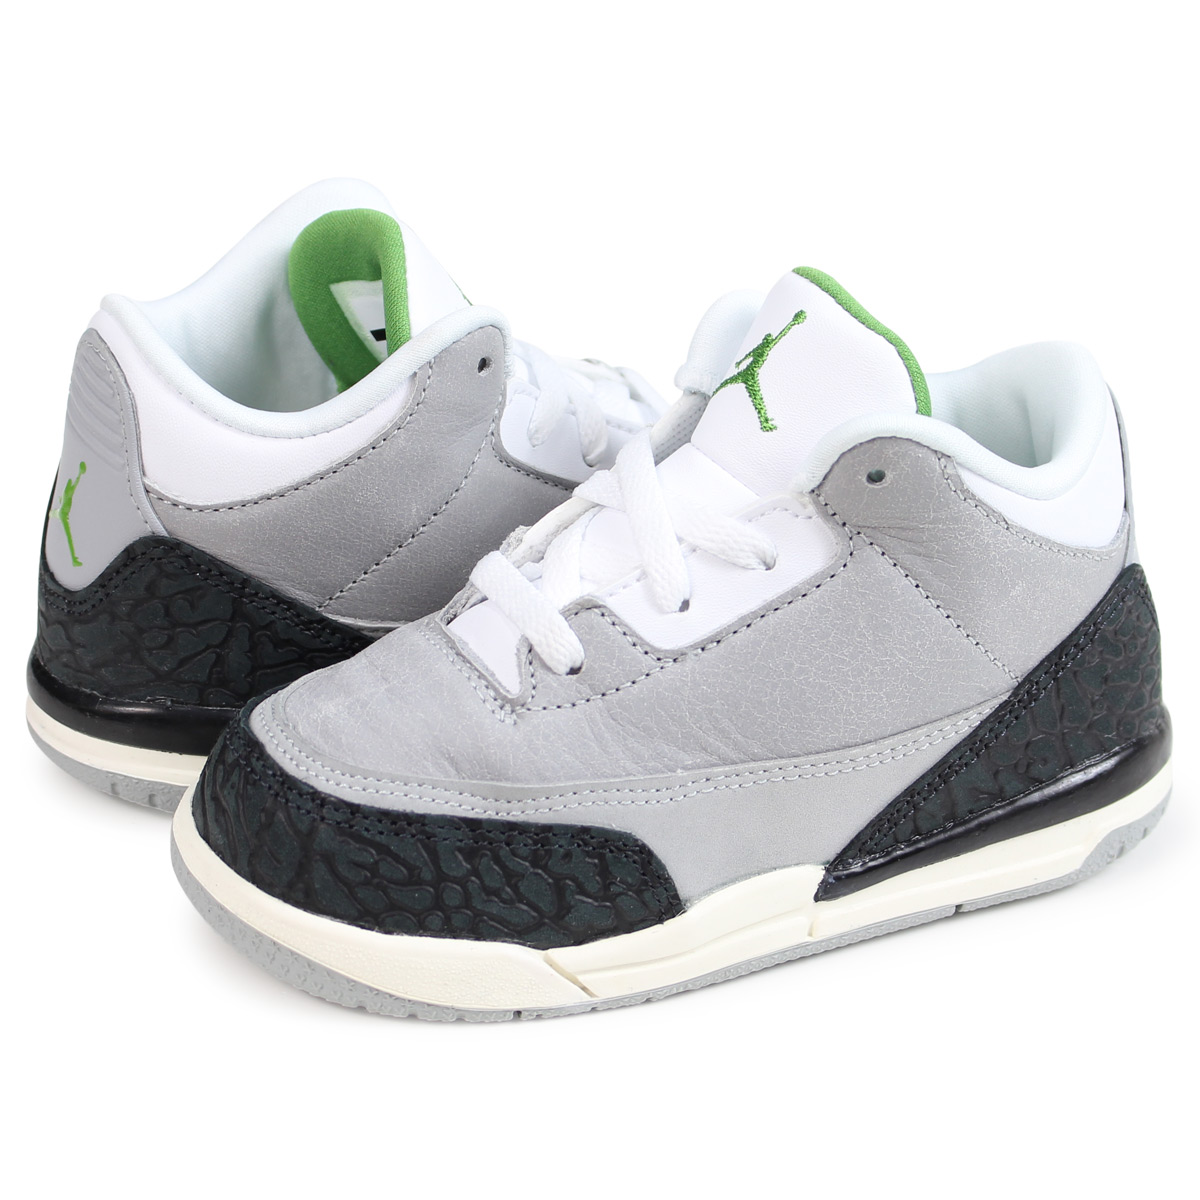 6de1163b3728d5 Nike NIKE Air Jordan 3 nostalgic baby sneakers AIR JORDAN 3 RETRO TD gray  832